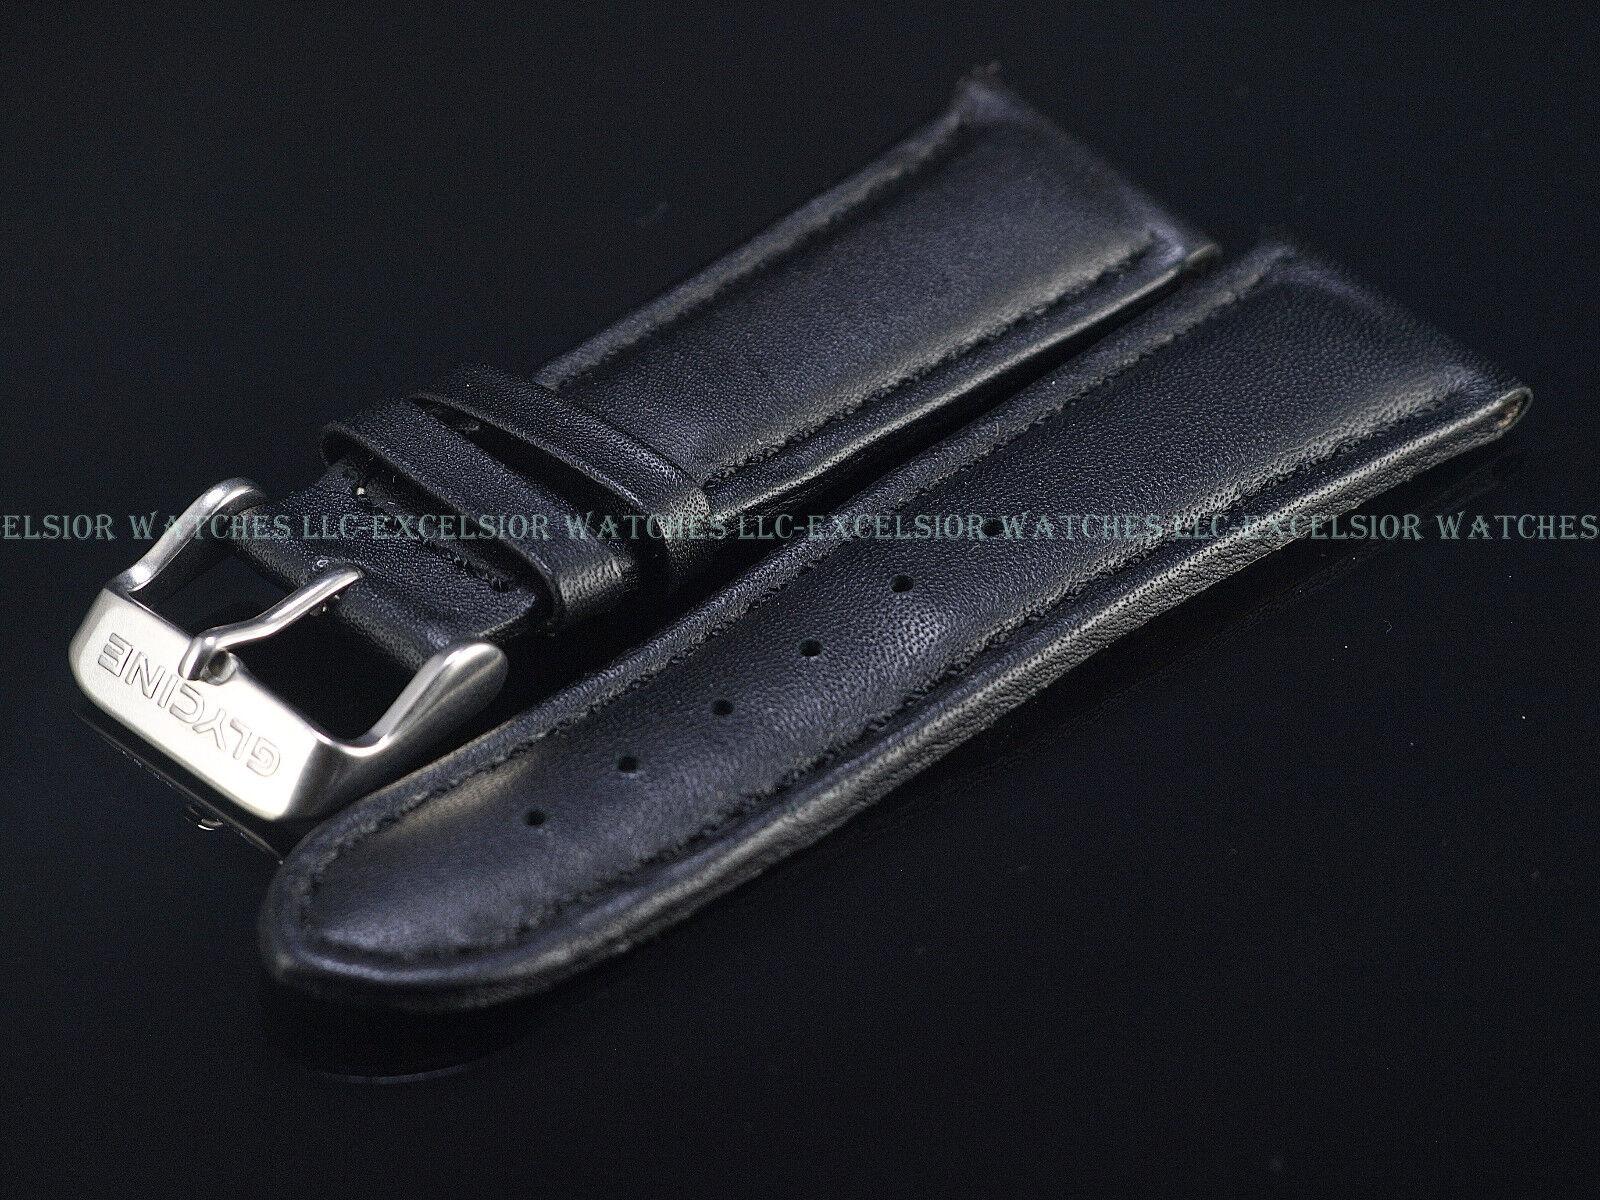 Neues OEM Glycine Uhrenarmband 24MM Leder Schwarz XS